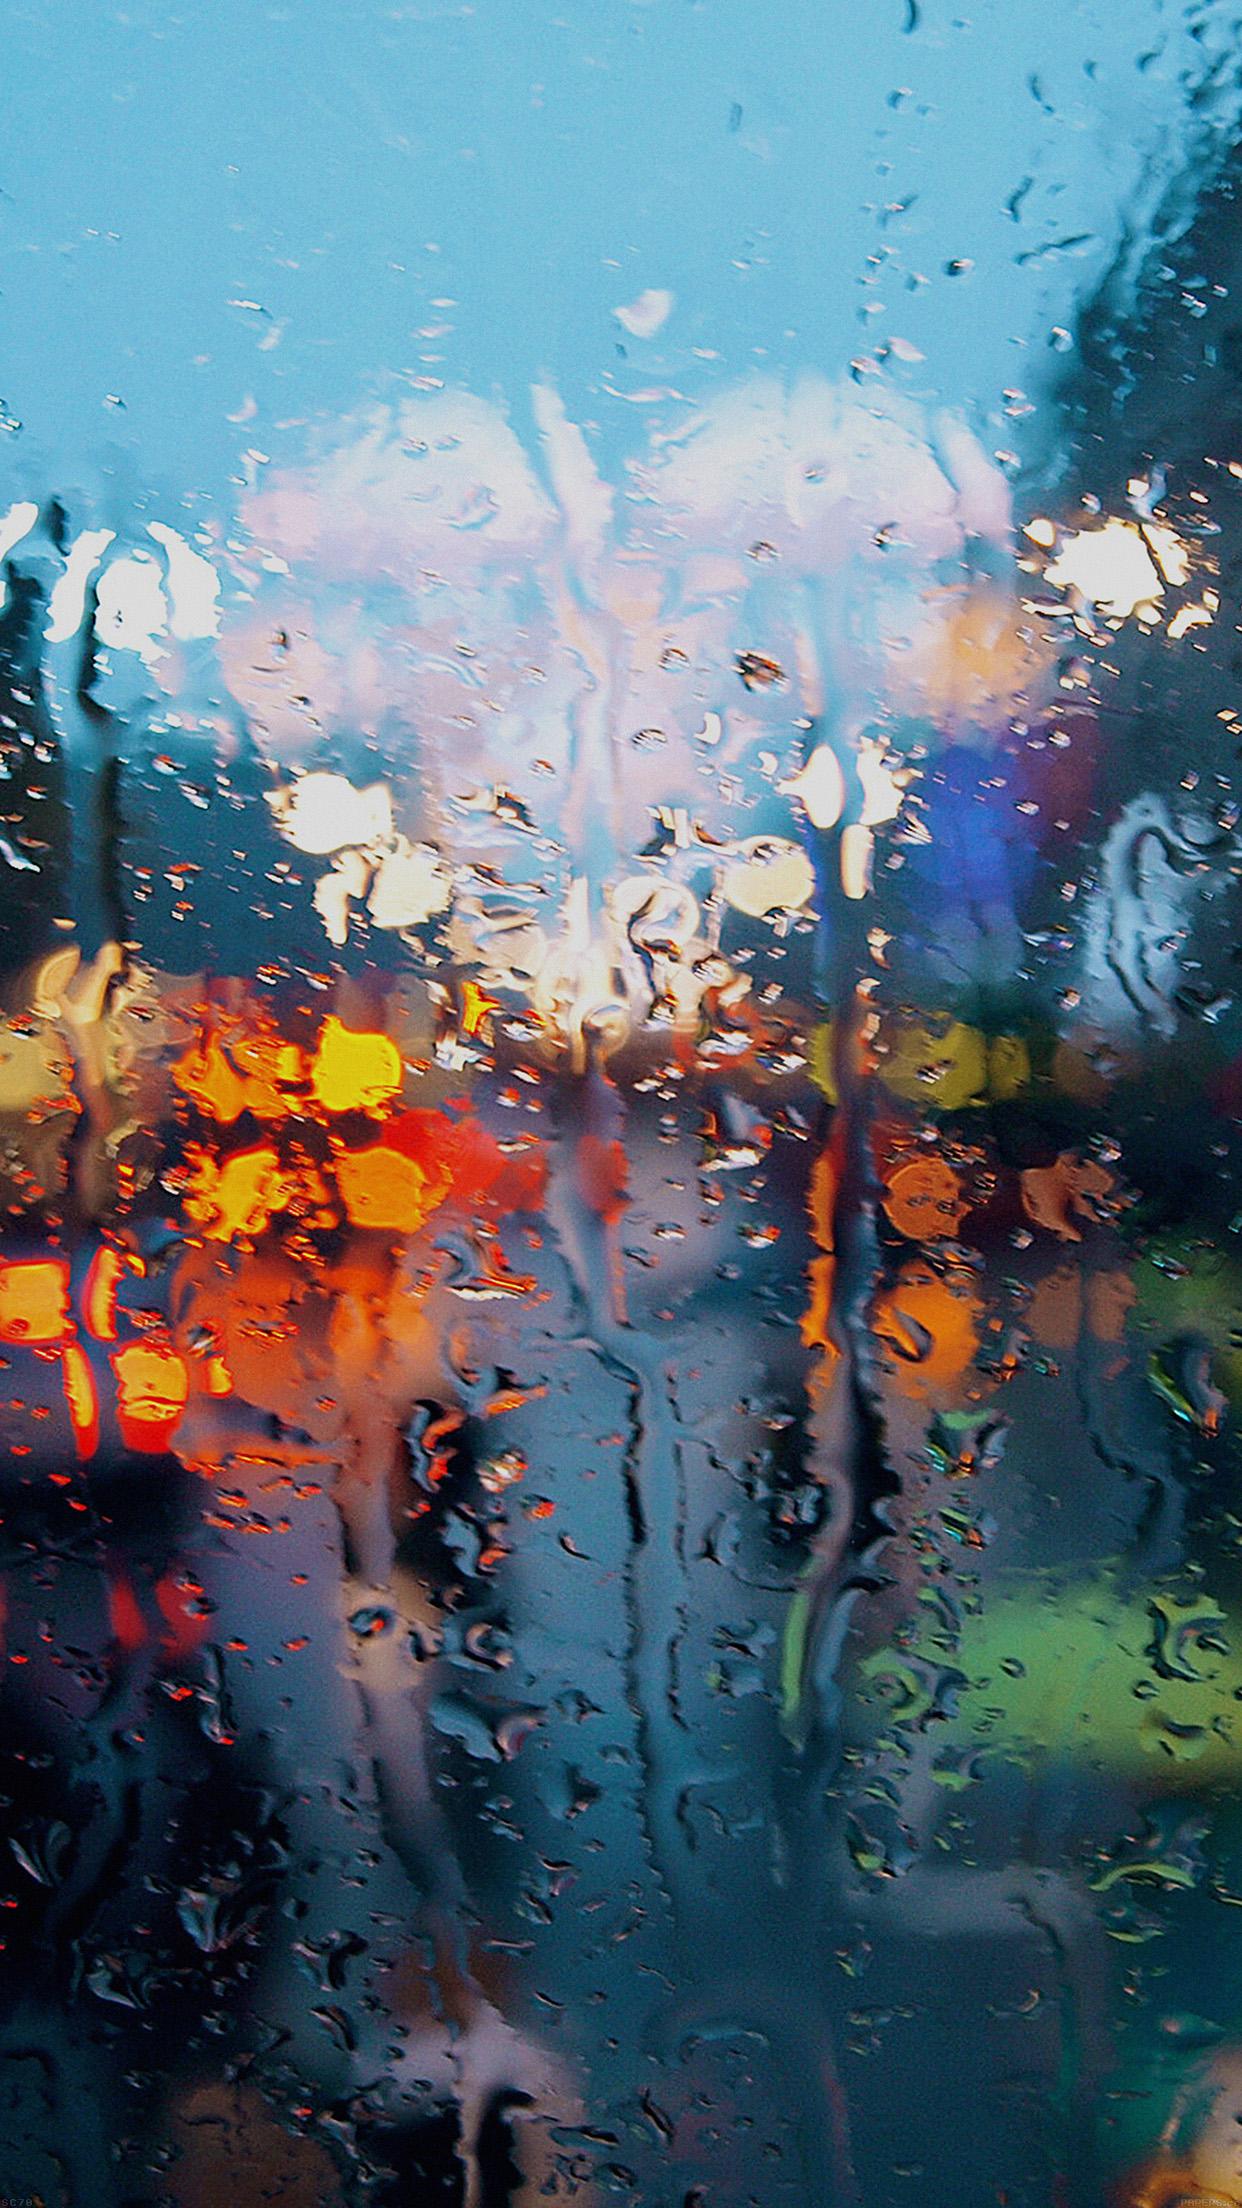 Awesome Iphone Wallpaper Rain Wallpaper Iphone 1242x2208 Wallpaper Teahub Io